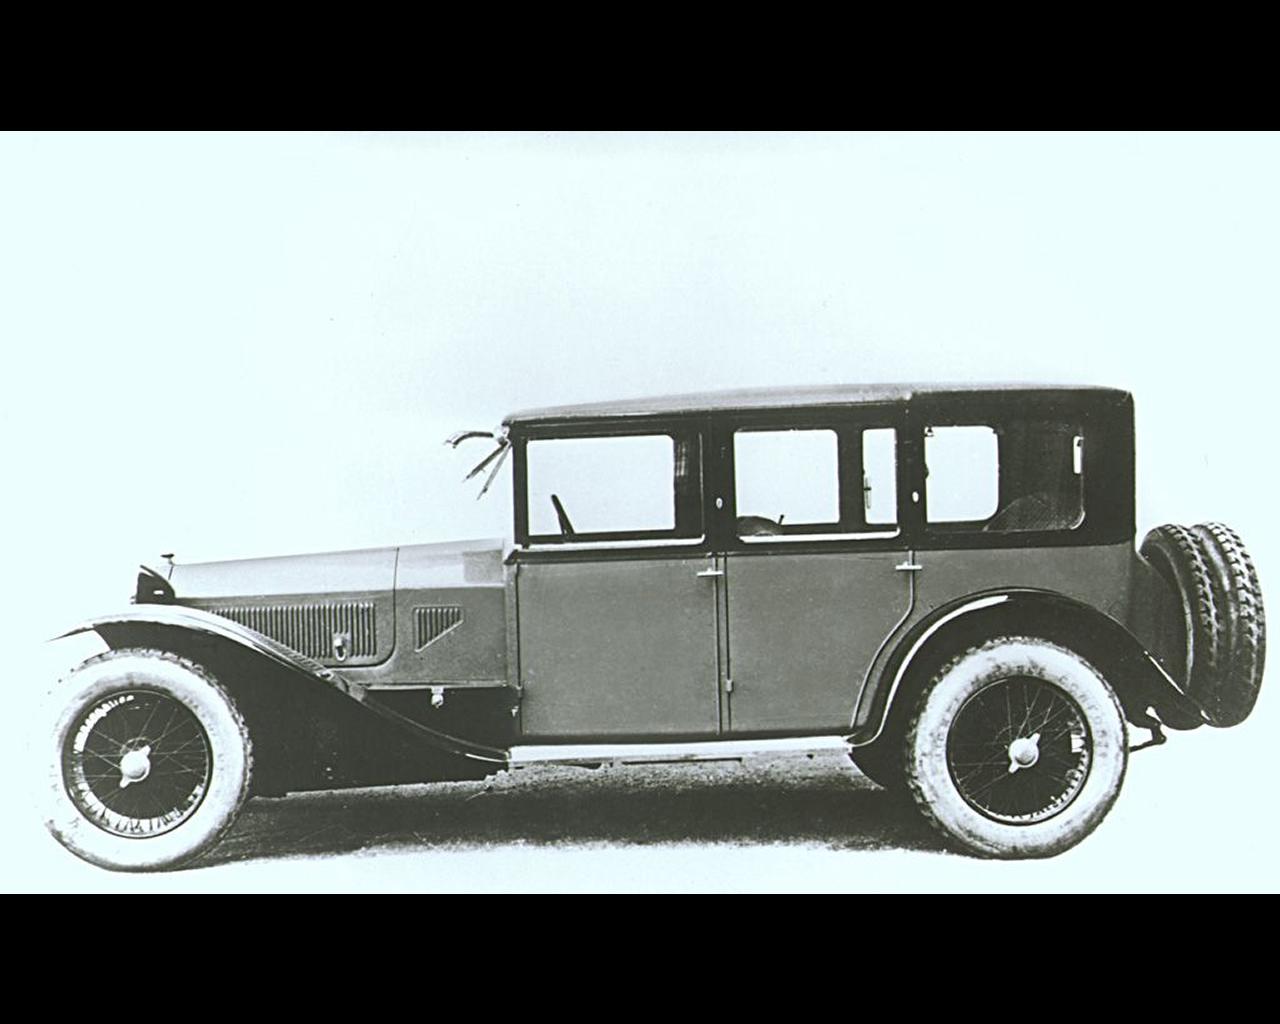 http://www.autoconcept-reviews.com/cars_reviews/lancia/lancia-lamda-1922-1931/wallpapers/8%20-%20Lancia%20Lambda%201922%201931.jpg